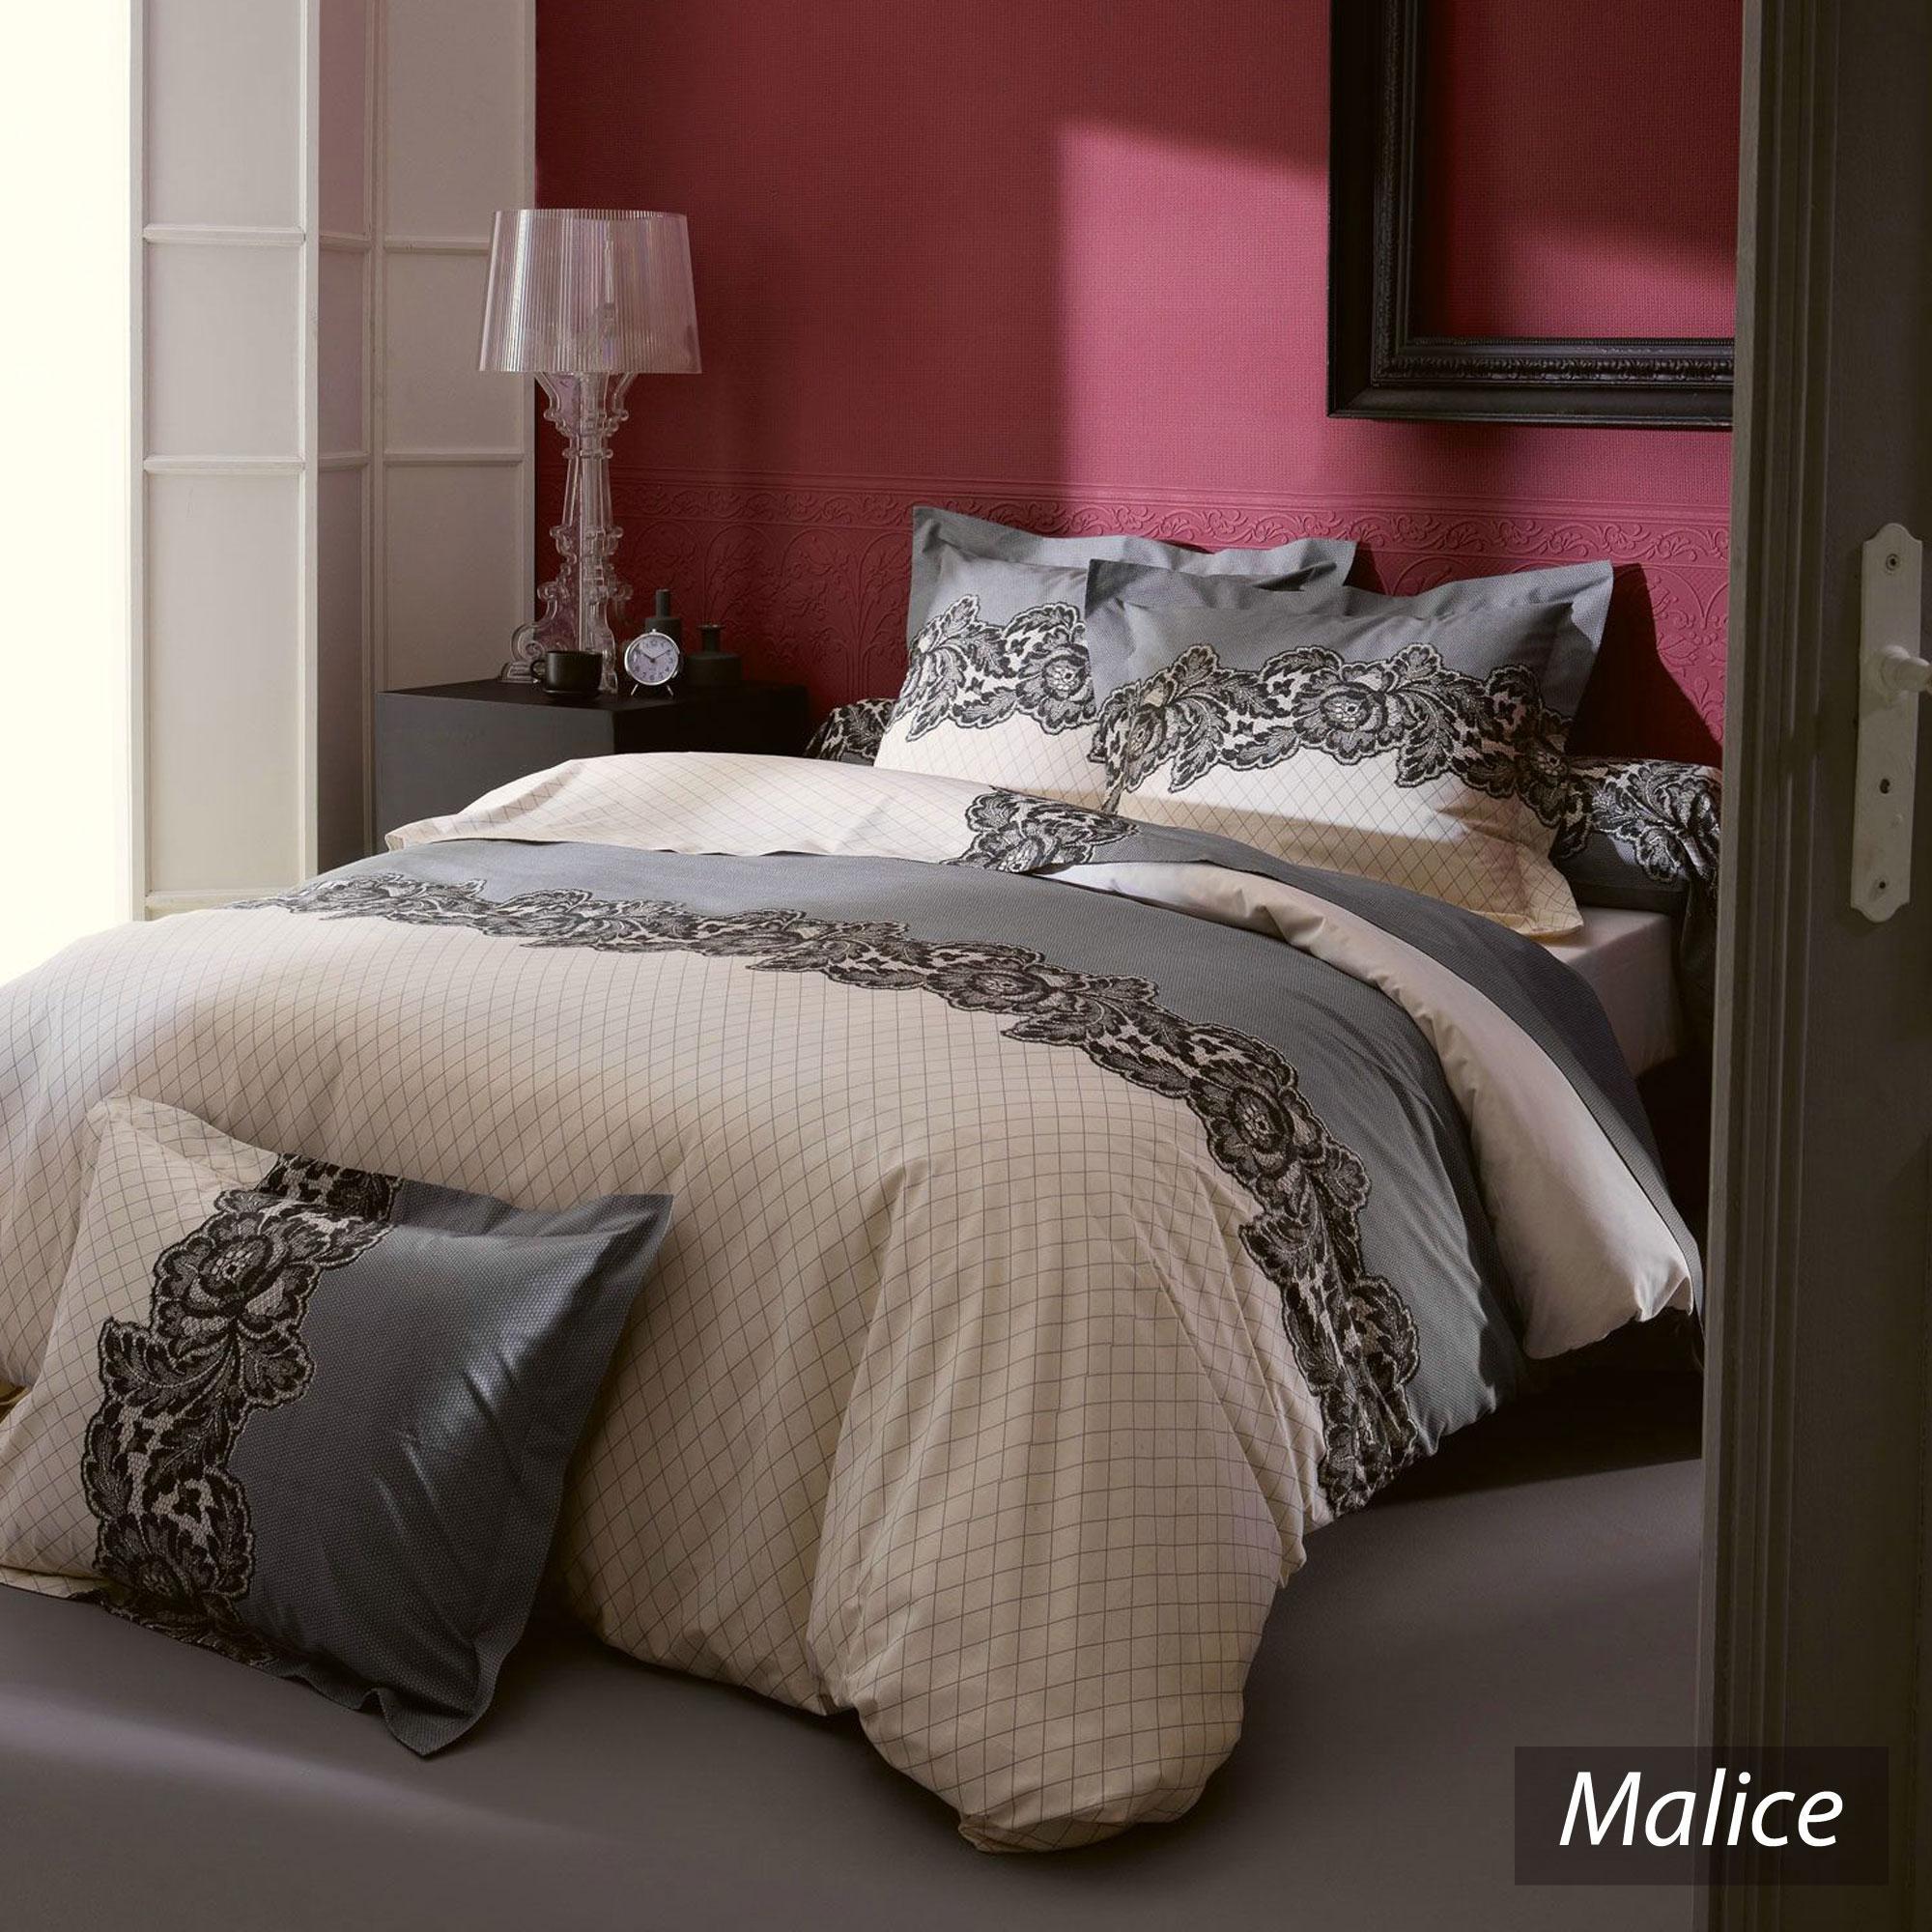 housse de couette 280x240 cm malice linnea vente de. Black Bedroom Furniture Sets. Home Design Ideas